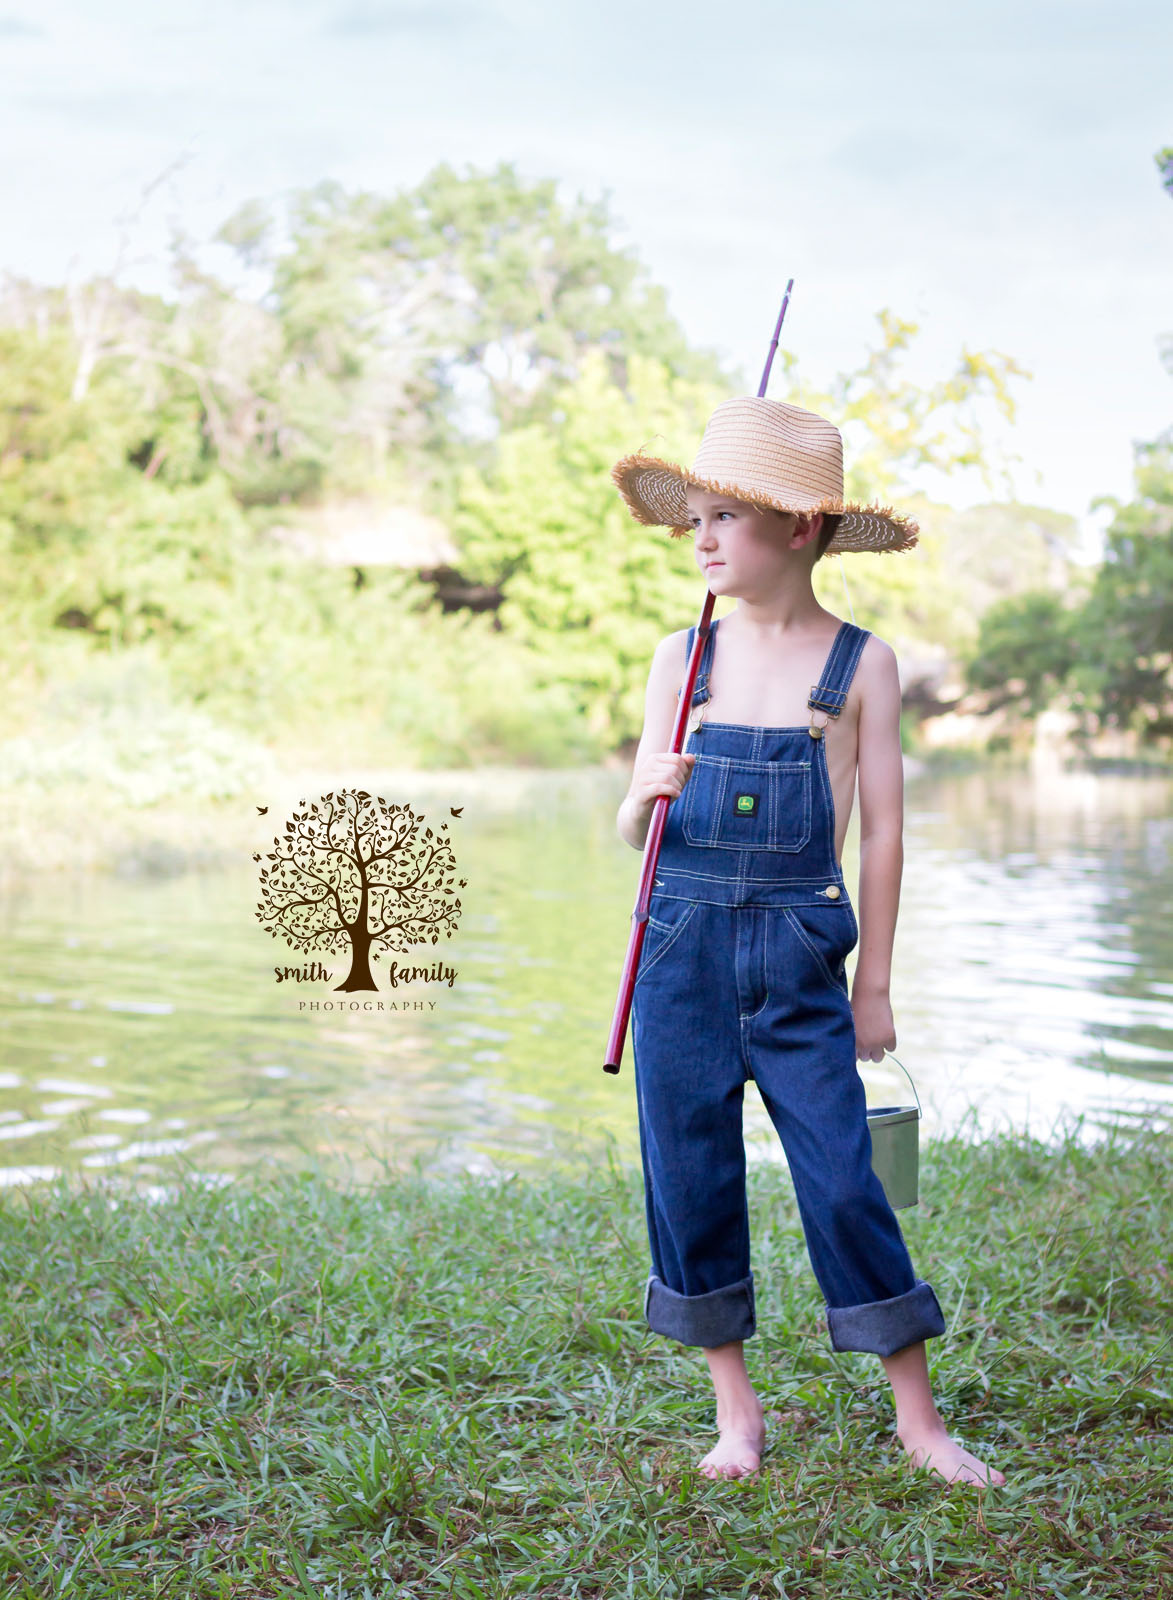 huckleberry_finn_limited_edition_session_smith_family_photography_waco